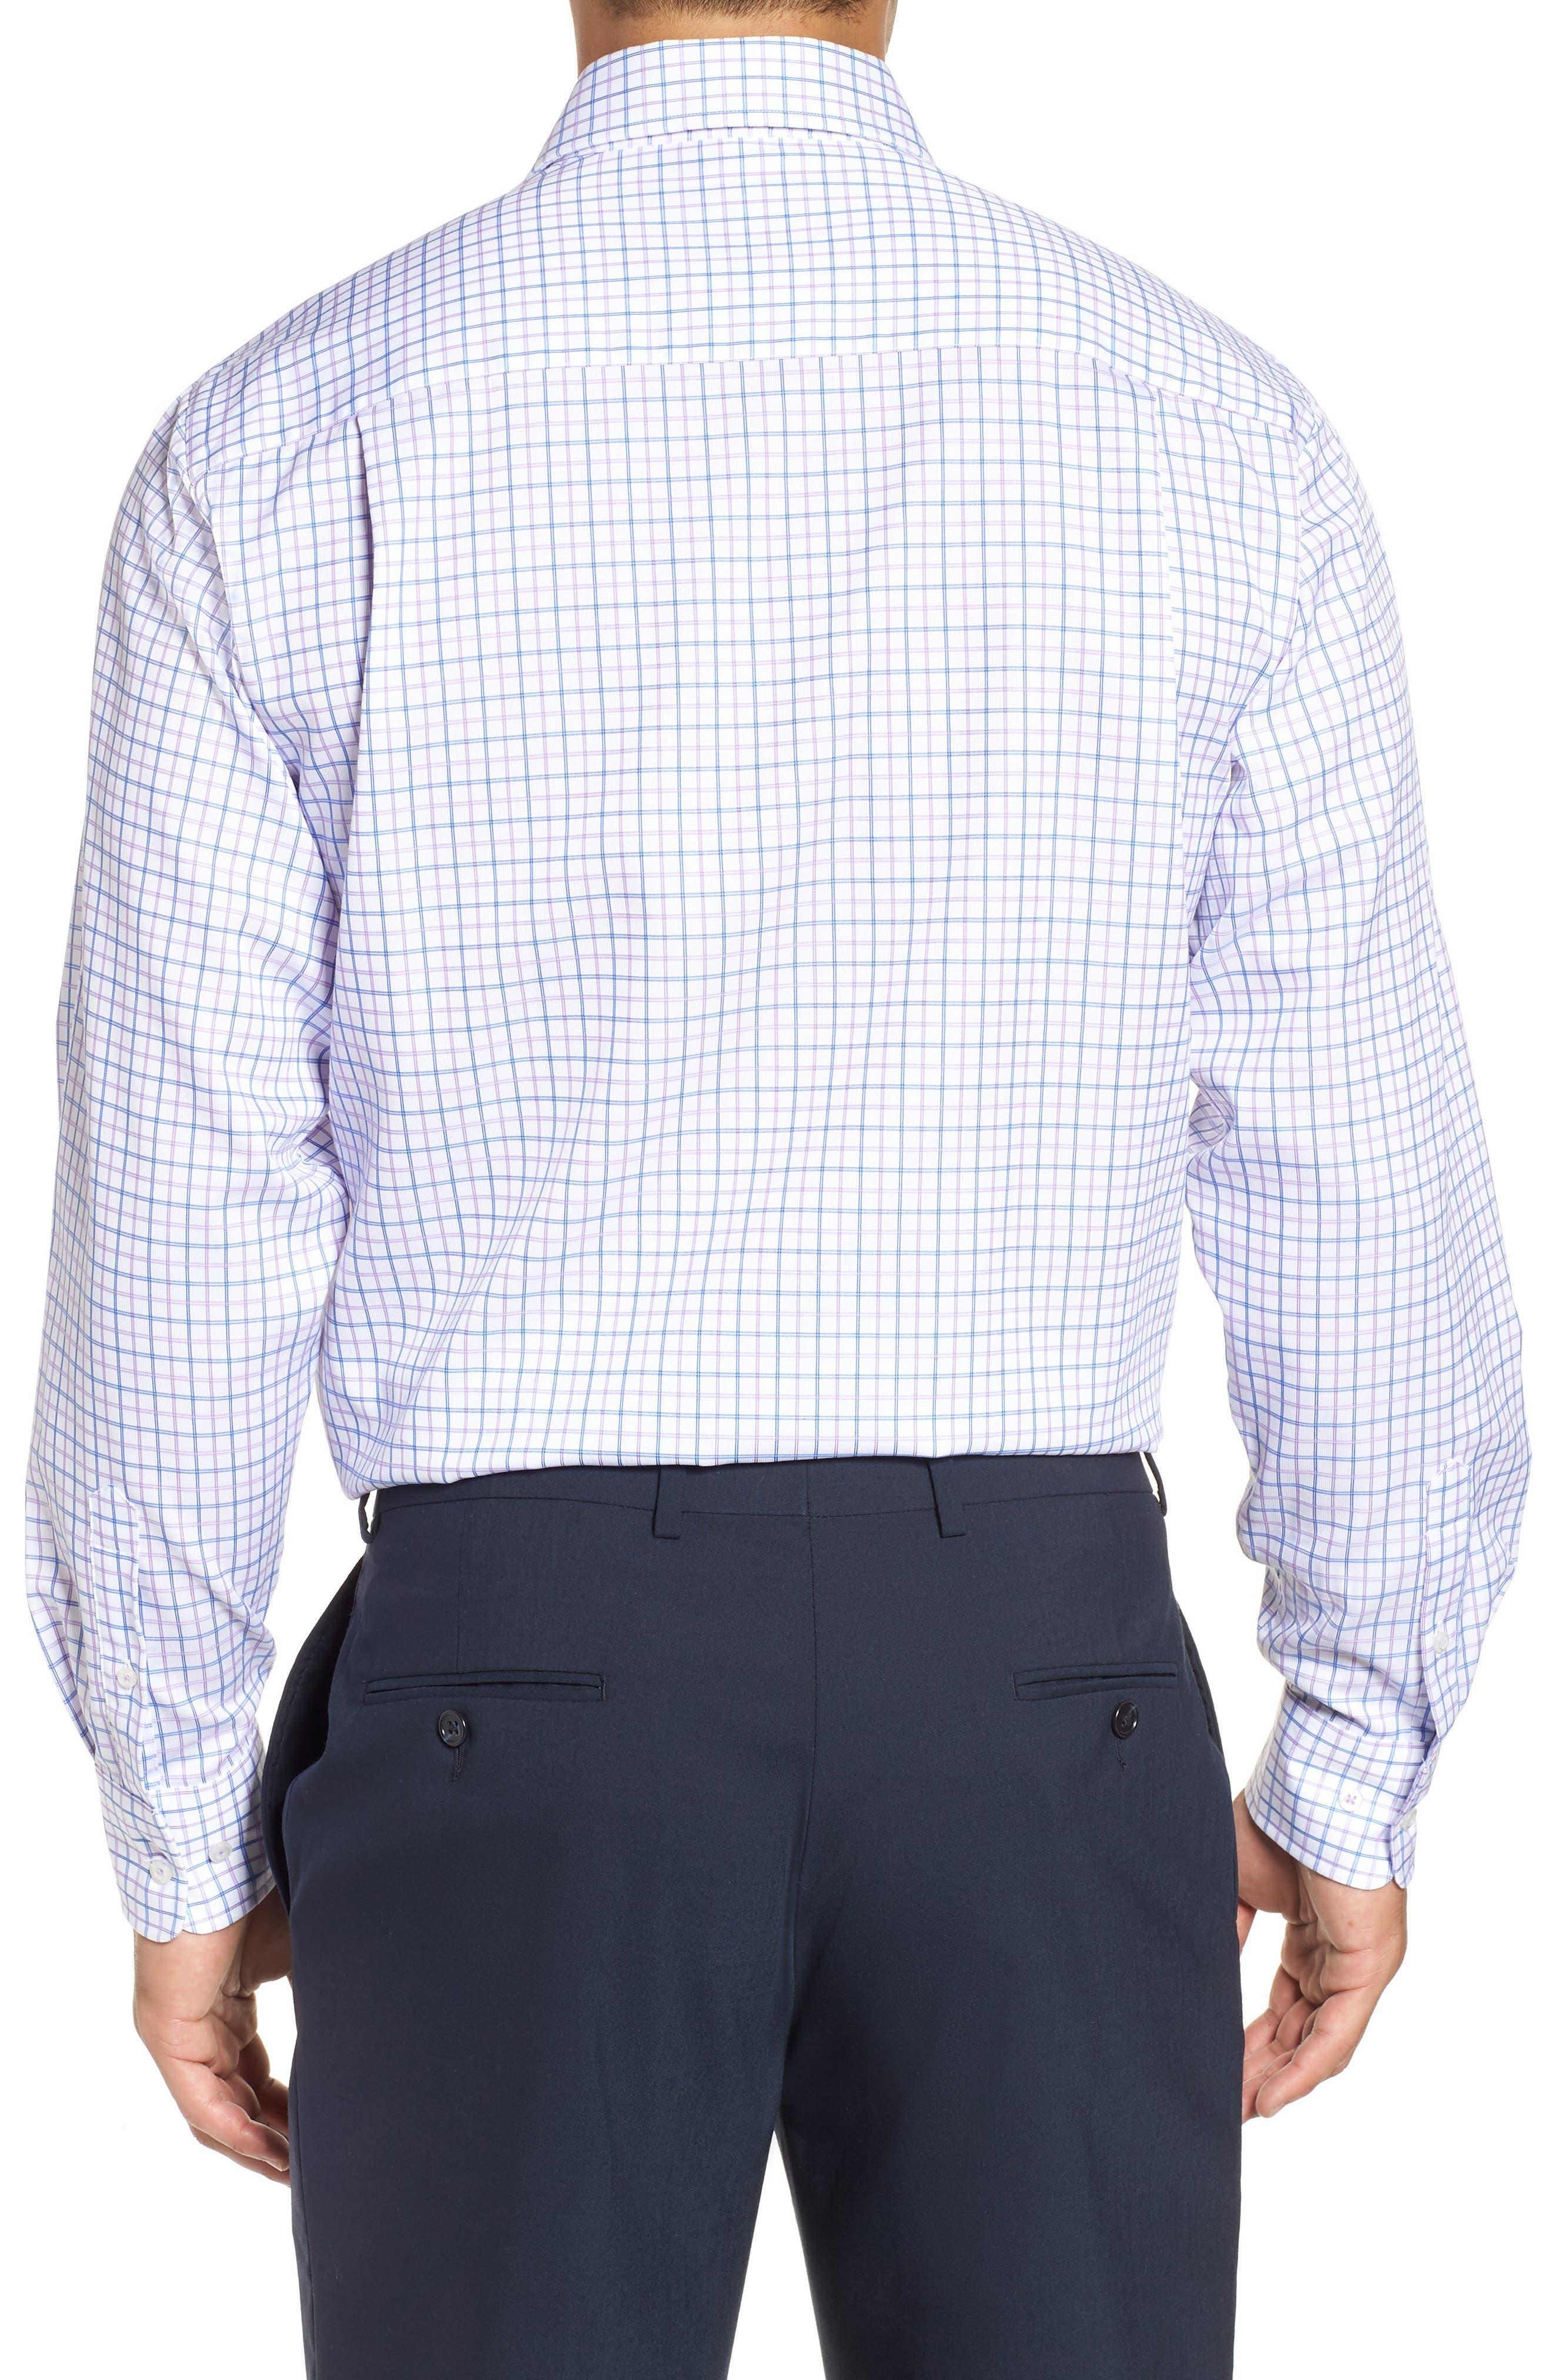 Regular Fit Check Dress Shirt,                             Alternate thumbnail 3, color,                             534